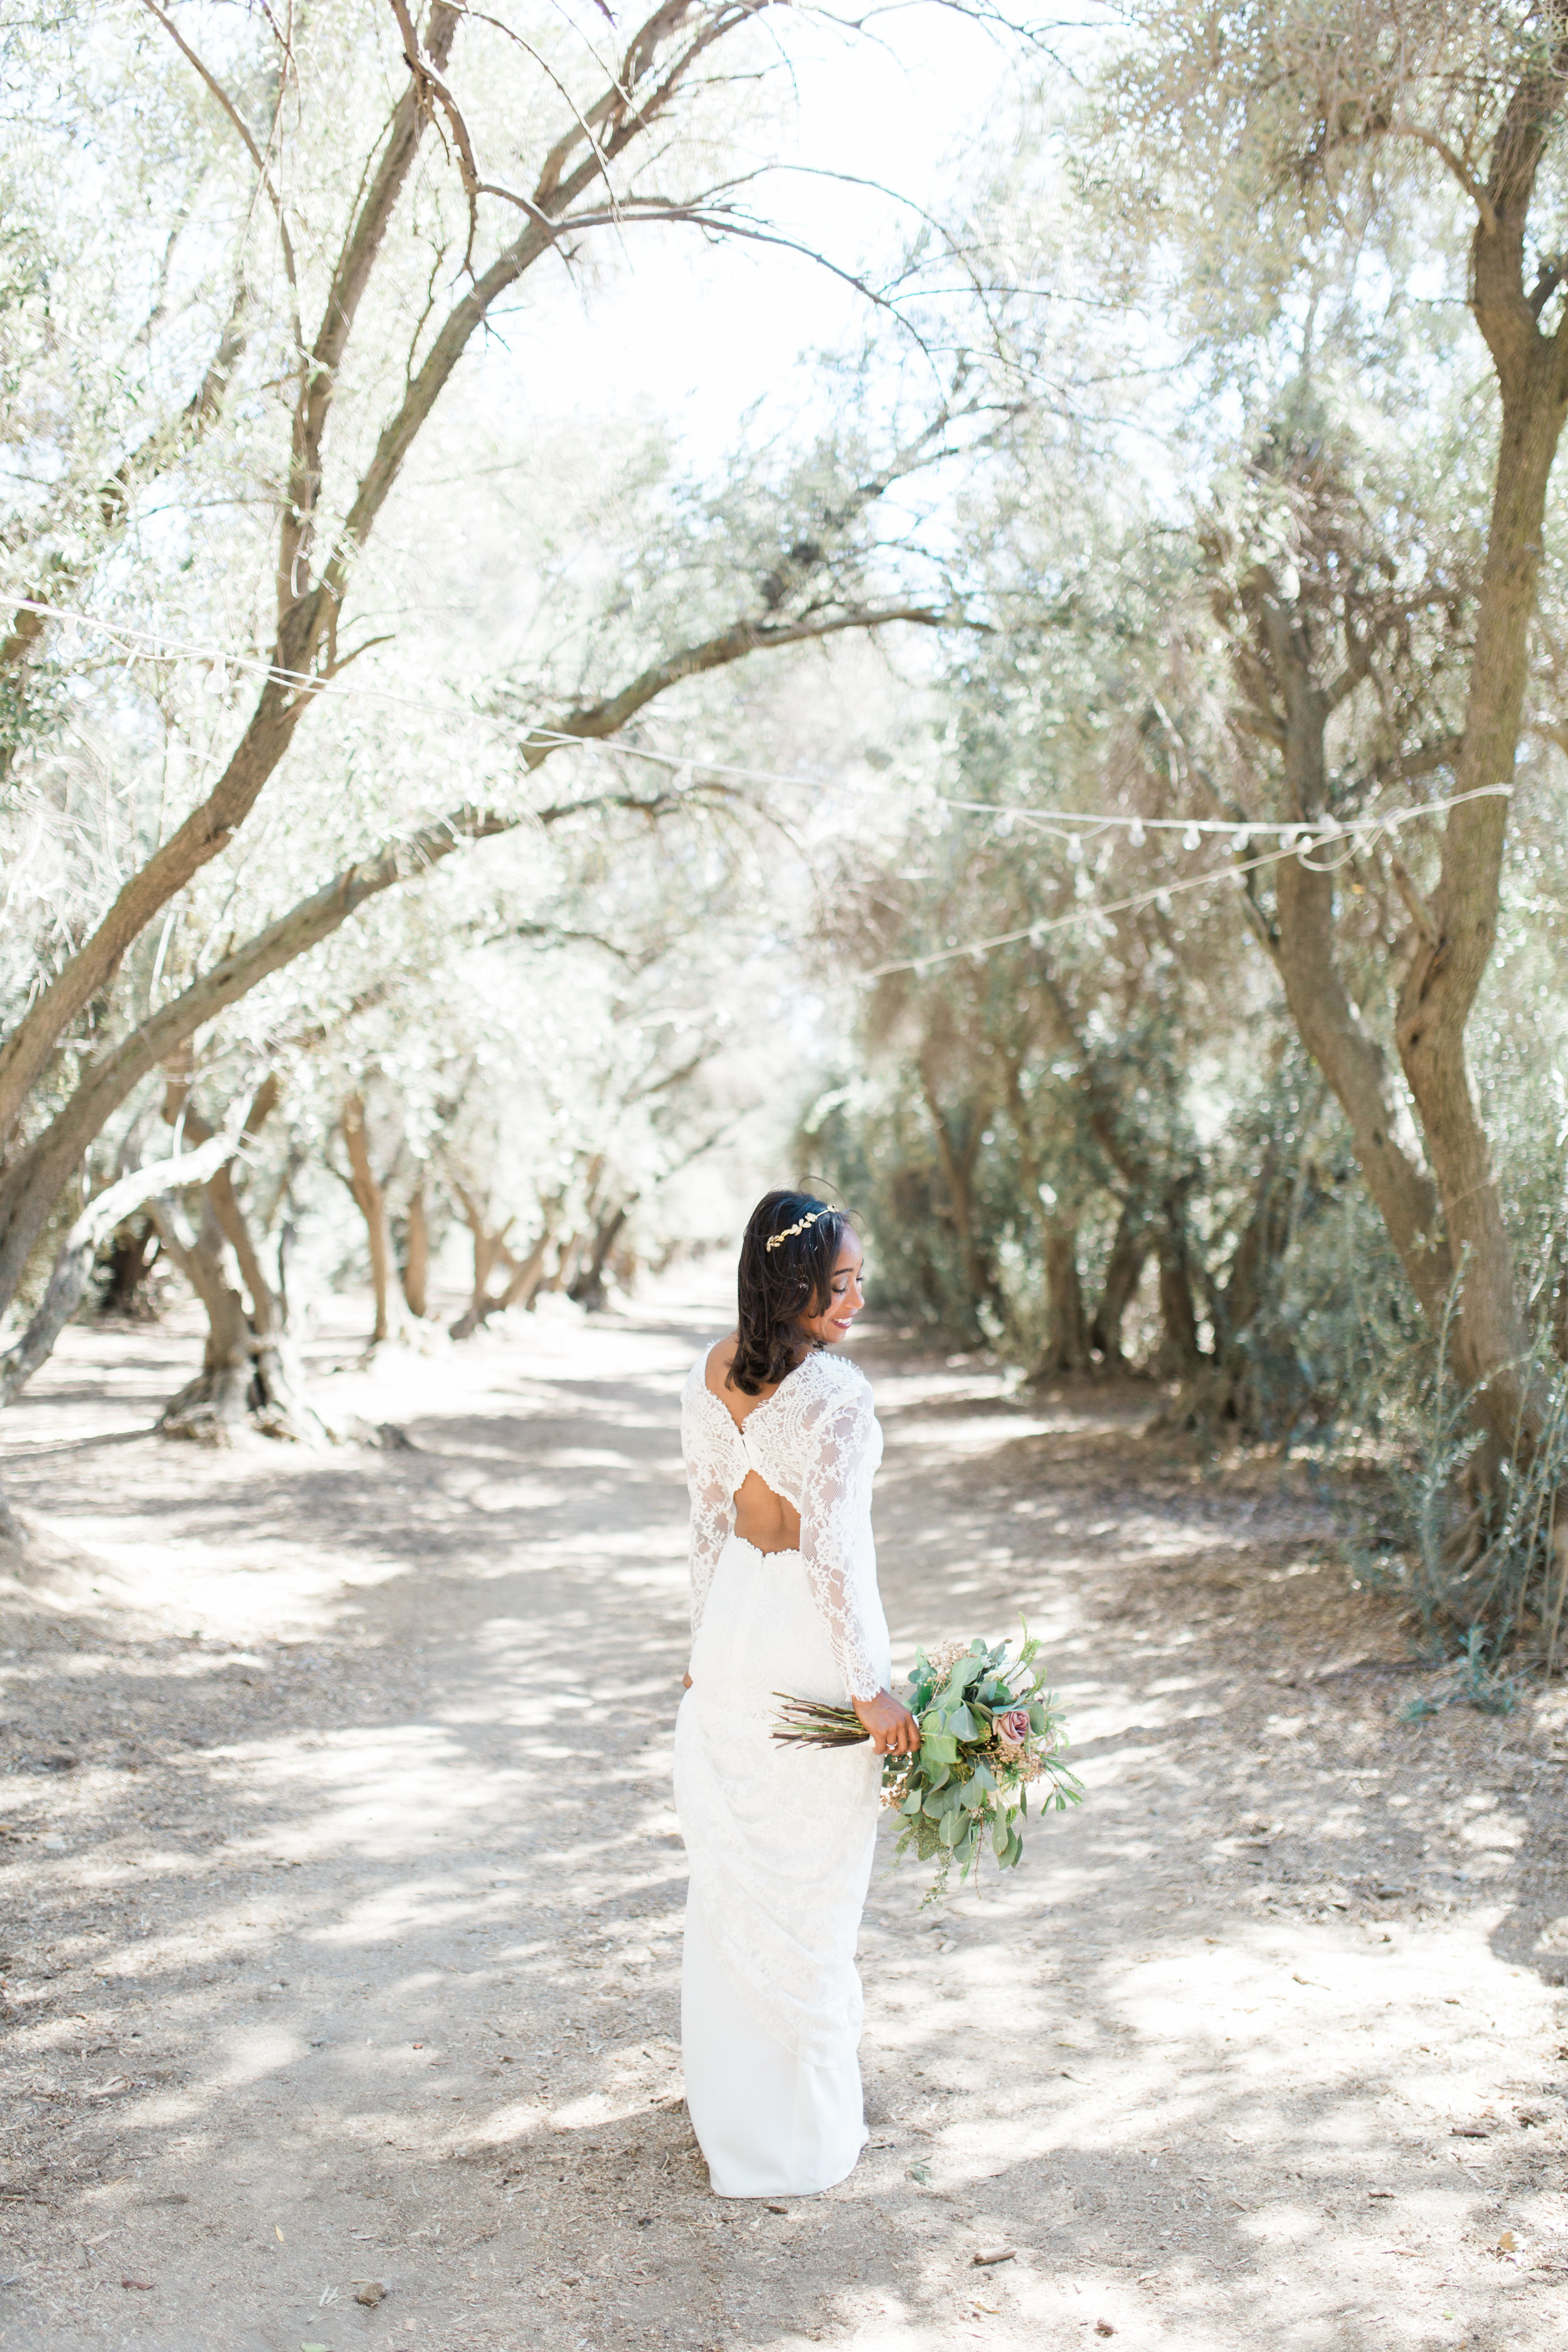 Jenny Quicksall Photography_www.jennyquicksall.com_California Wedding Photographer_Highland Springs Ranch and Inn Resort_Cherry Valley California (15).JPG